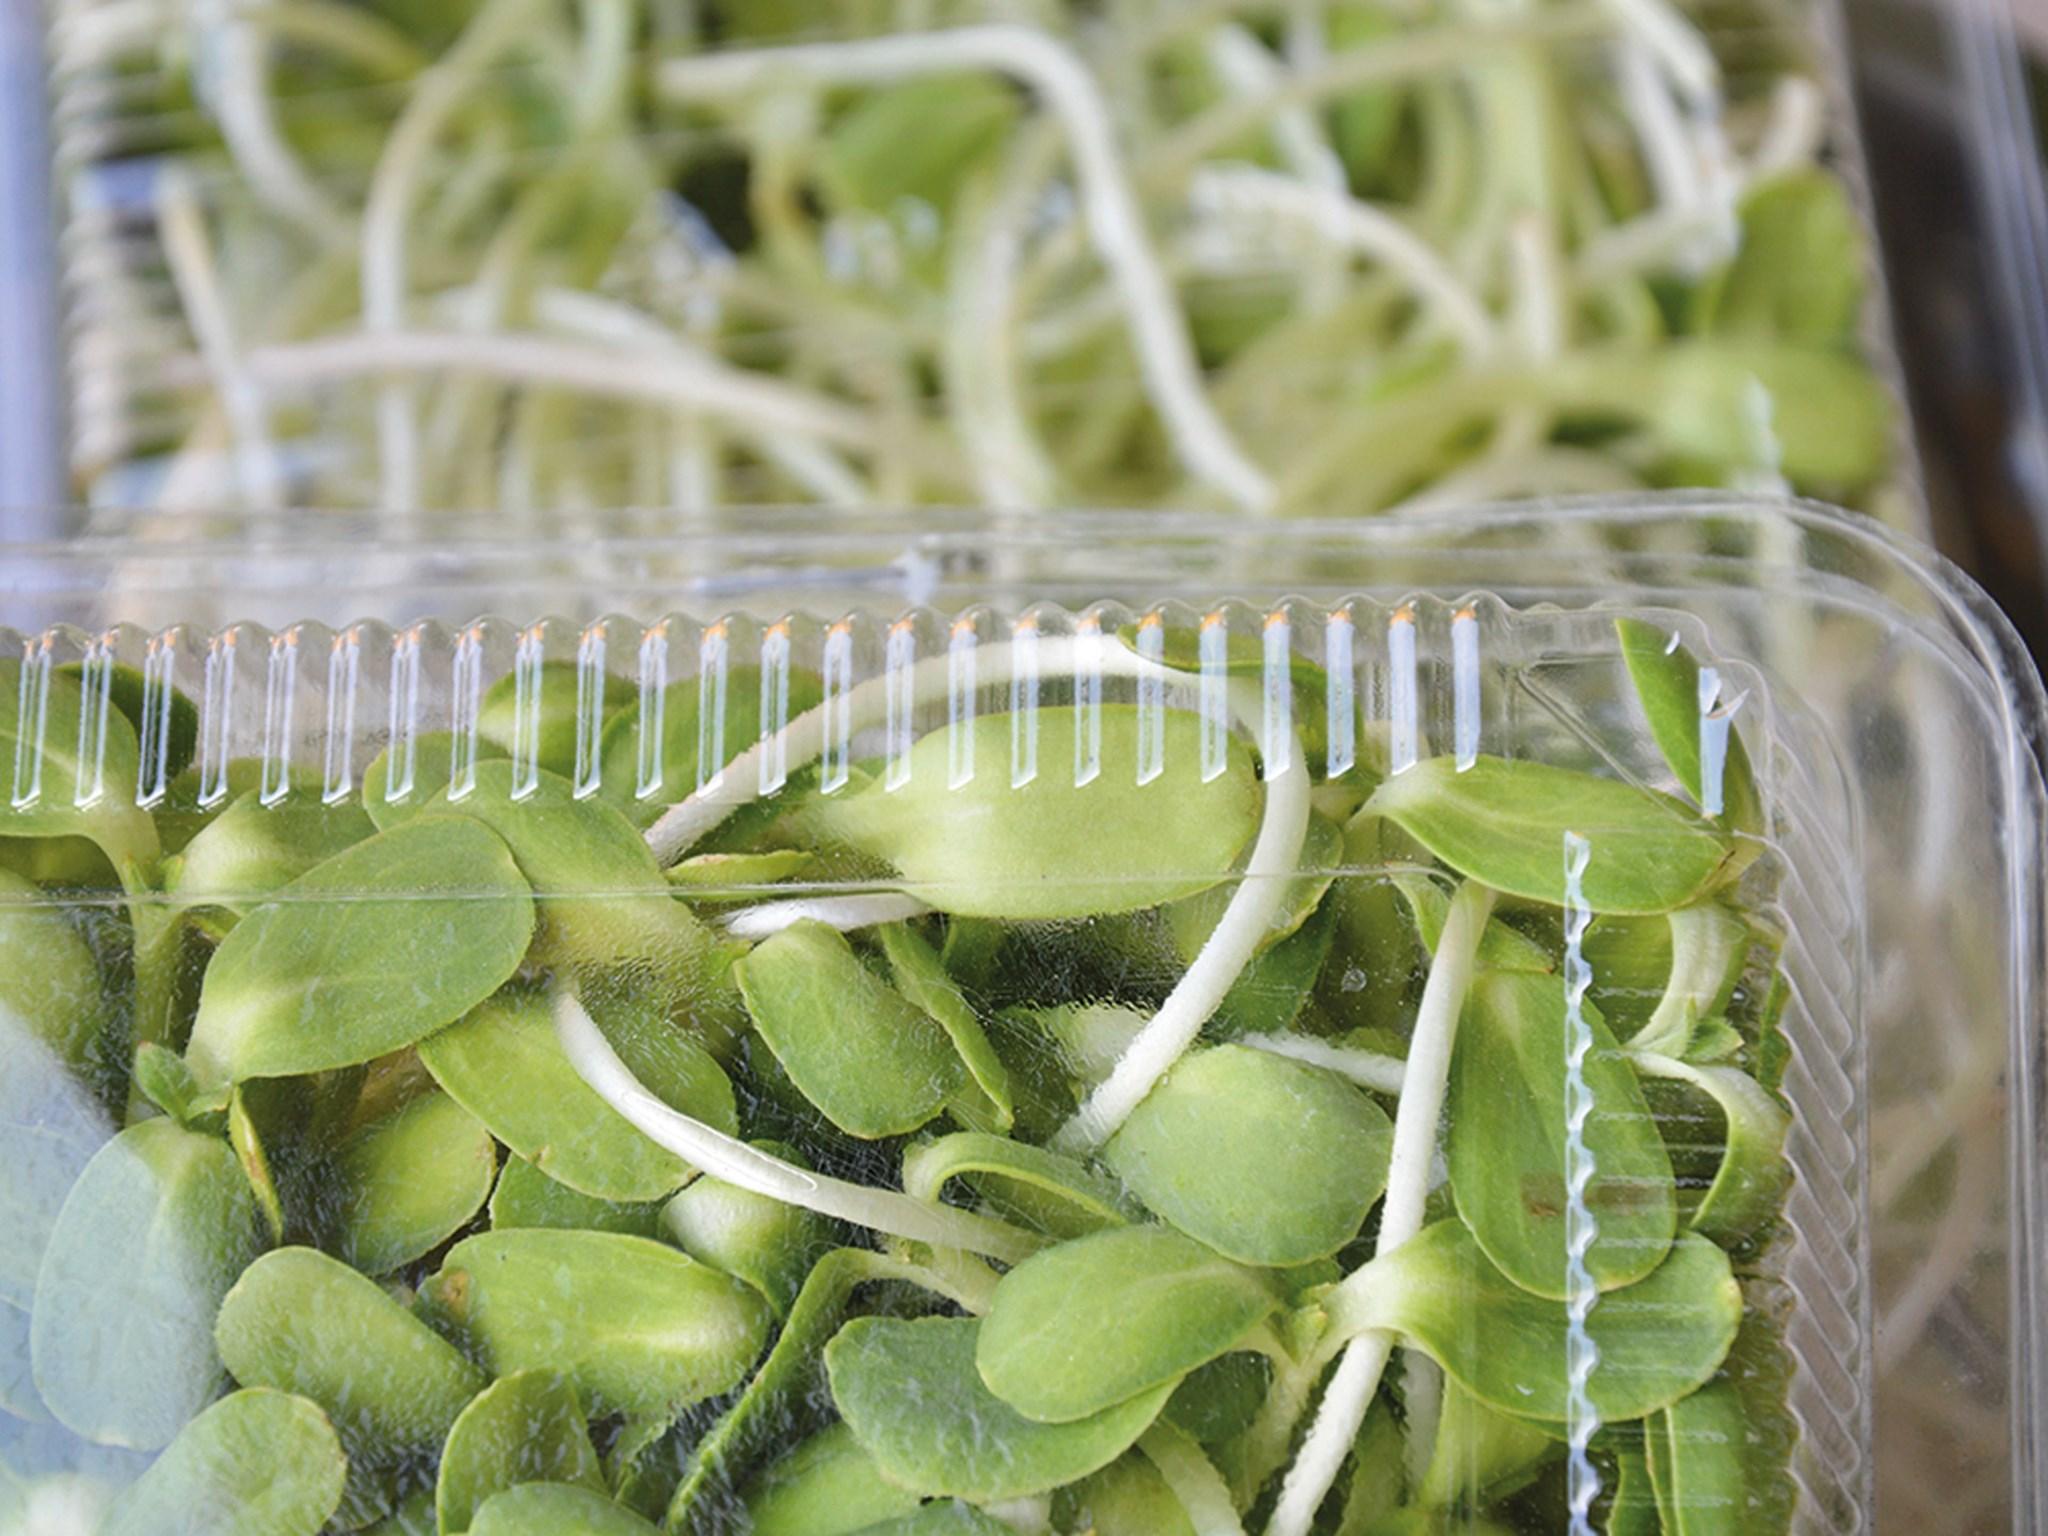 Einar anti-fog coating additives are bio-based and food-grade